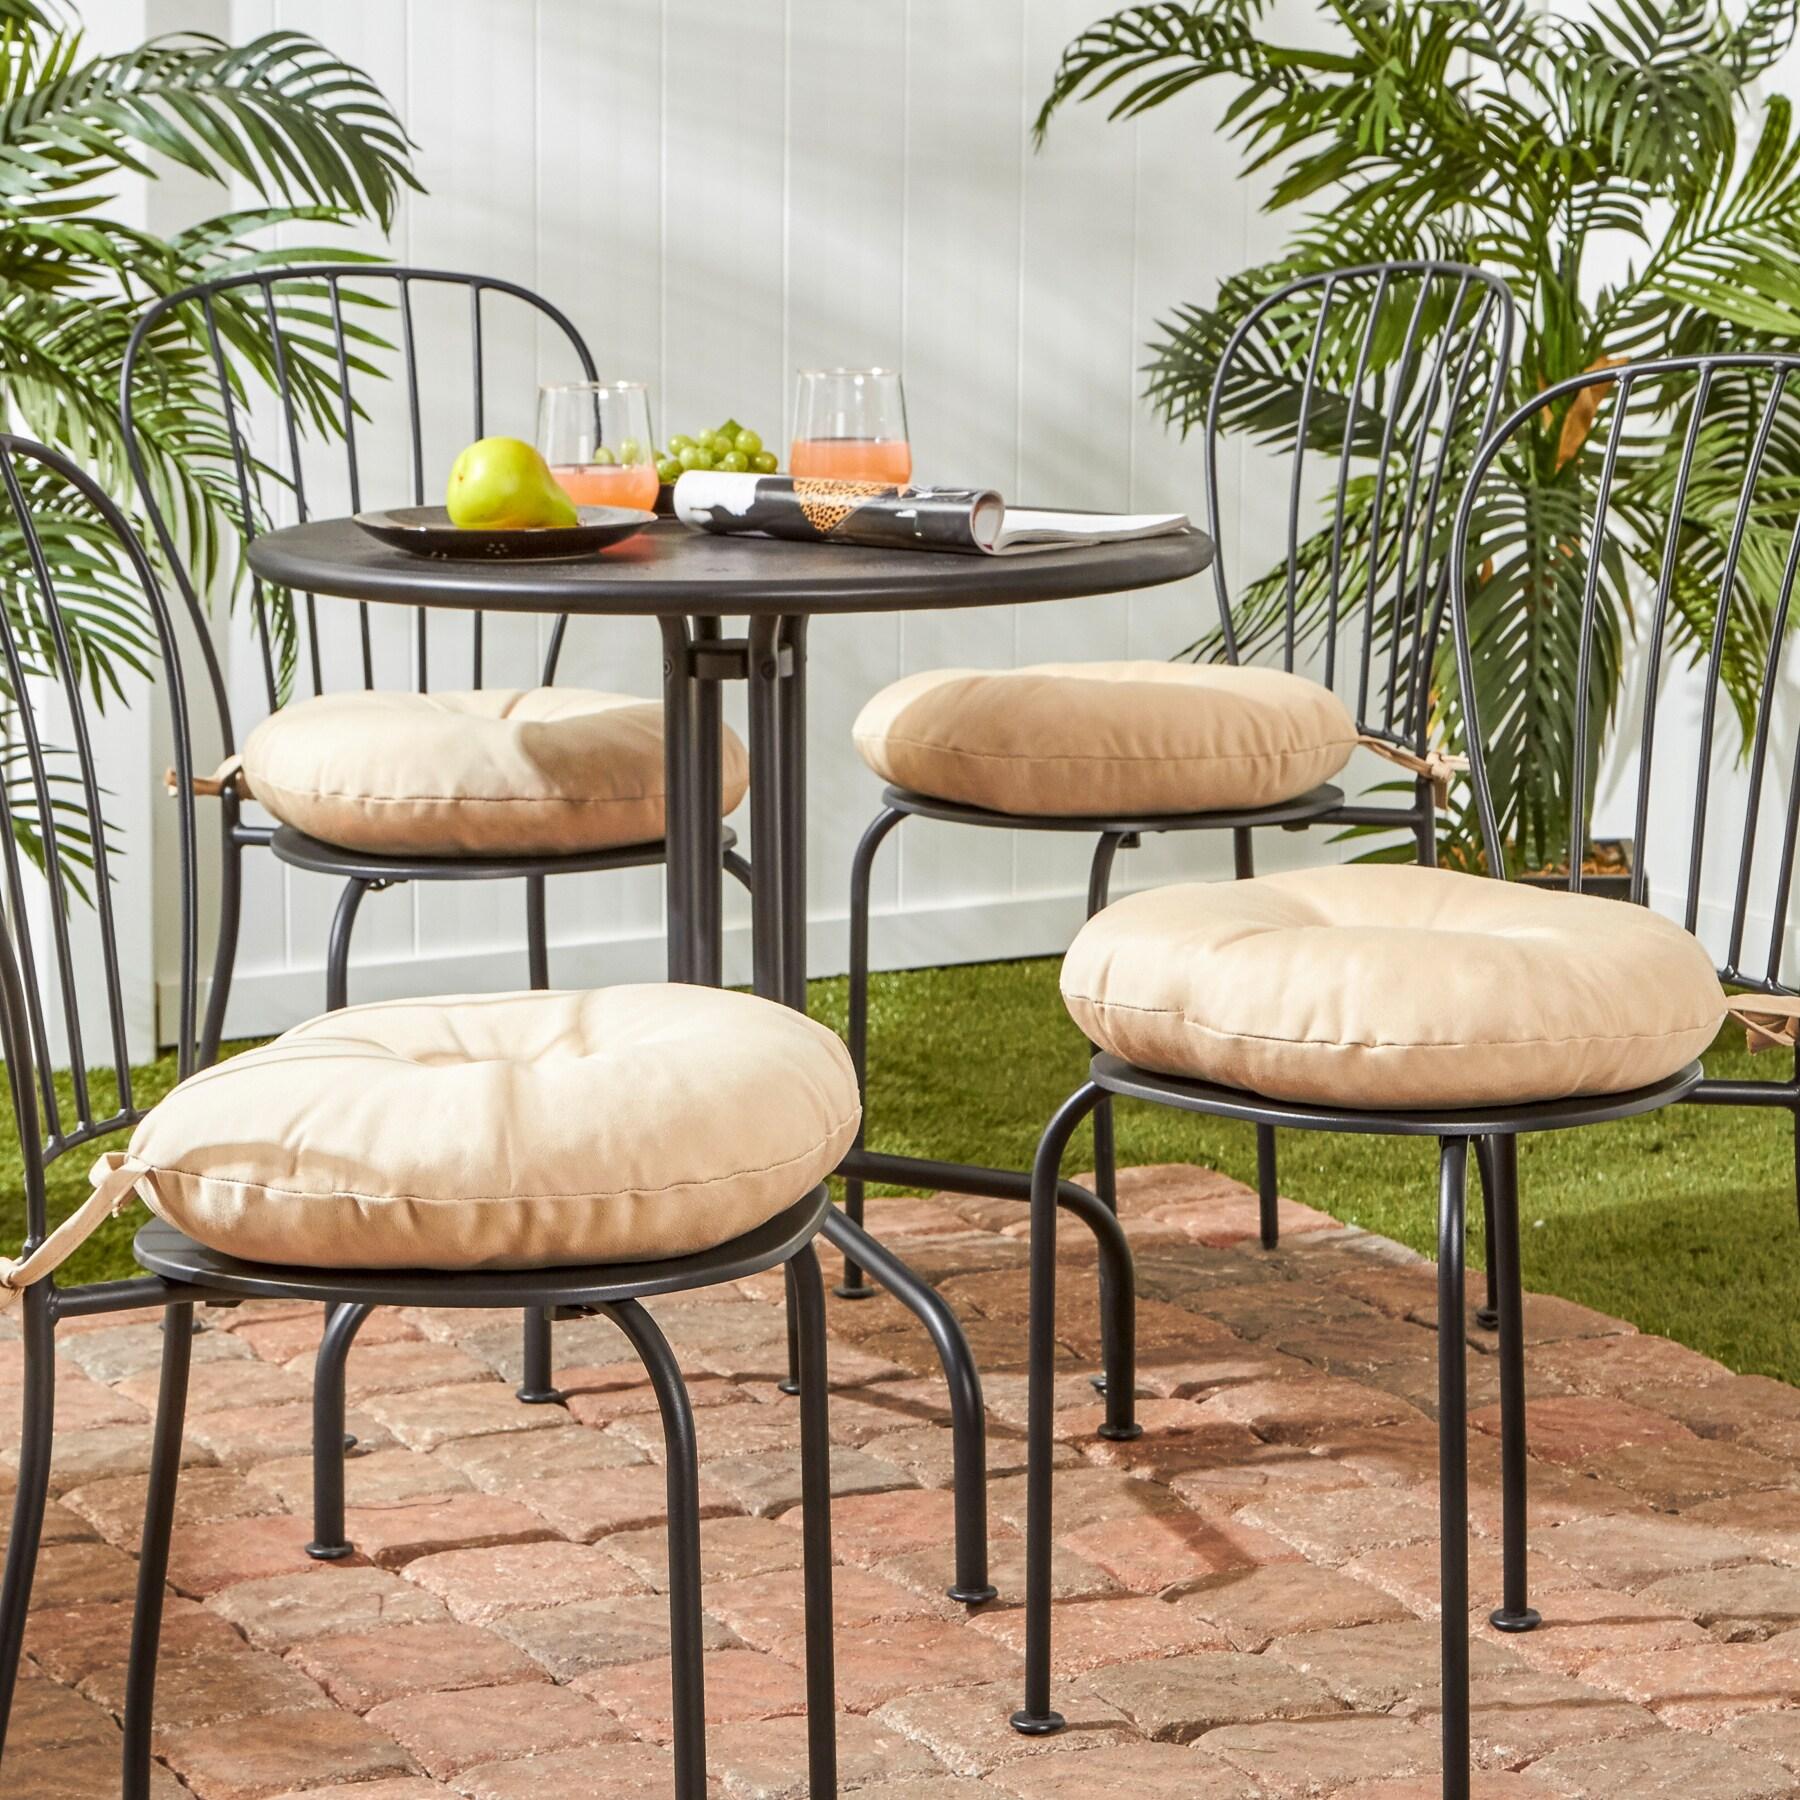 Fantastic Havenside Home Driftwood 15 Inch Round Outdoor Solid Bistro Chair Cushion Set Of 4 Frankydiablos Diy Chair Ideas Frankydiabloscom